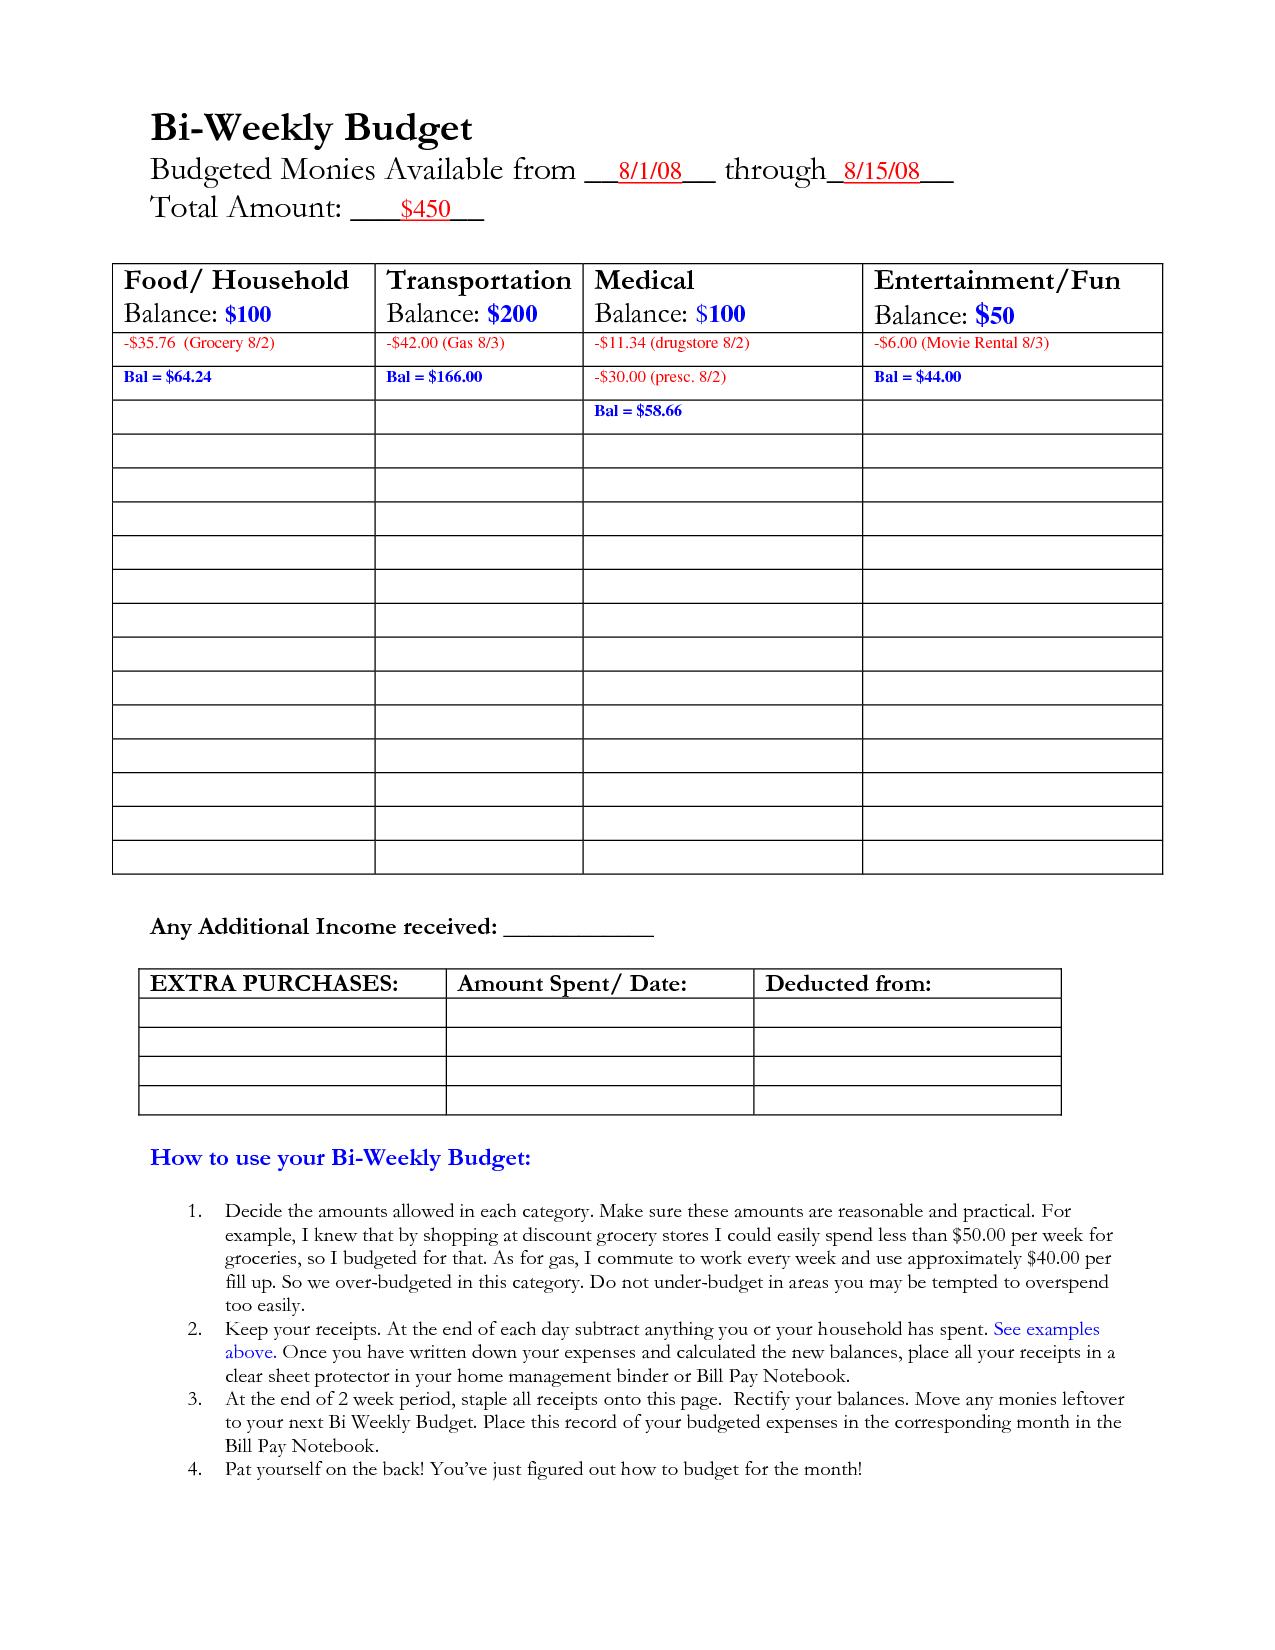 Bi Weekly Budget Calculator Spreadsheet Bonfires And Wine Livin - Free Printable Bi Weekly Budget Template